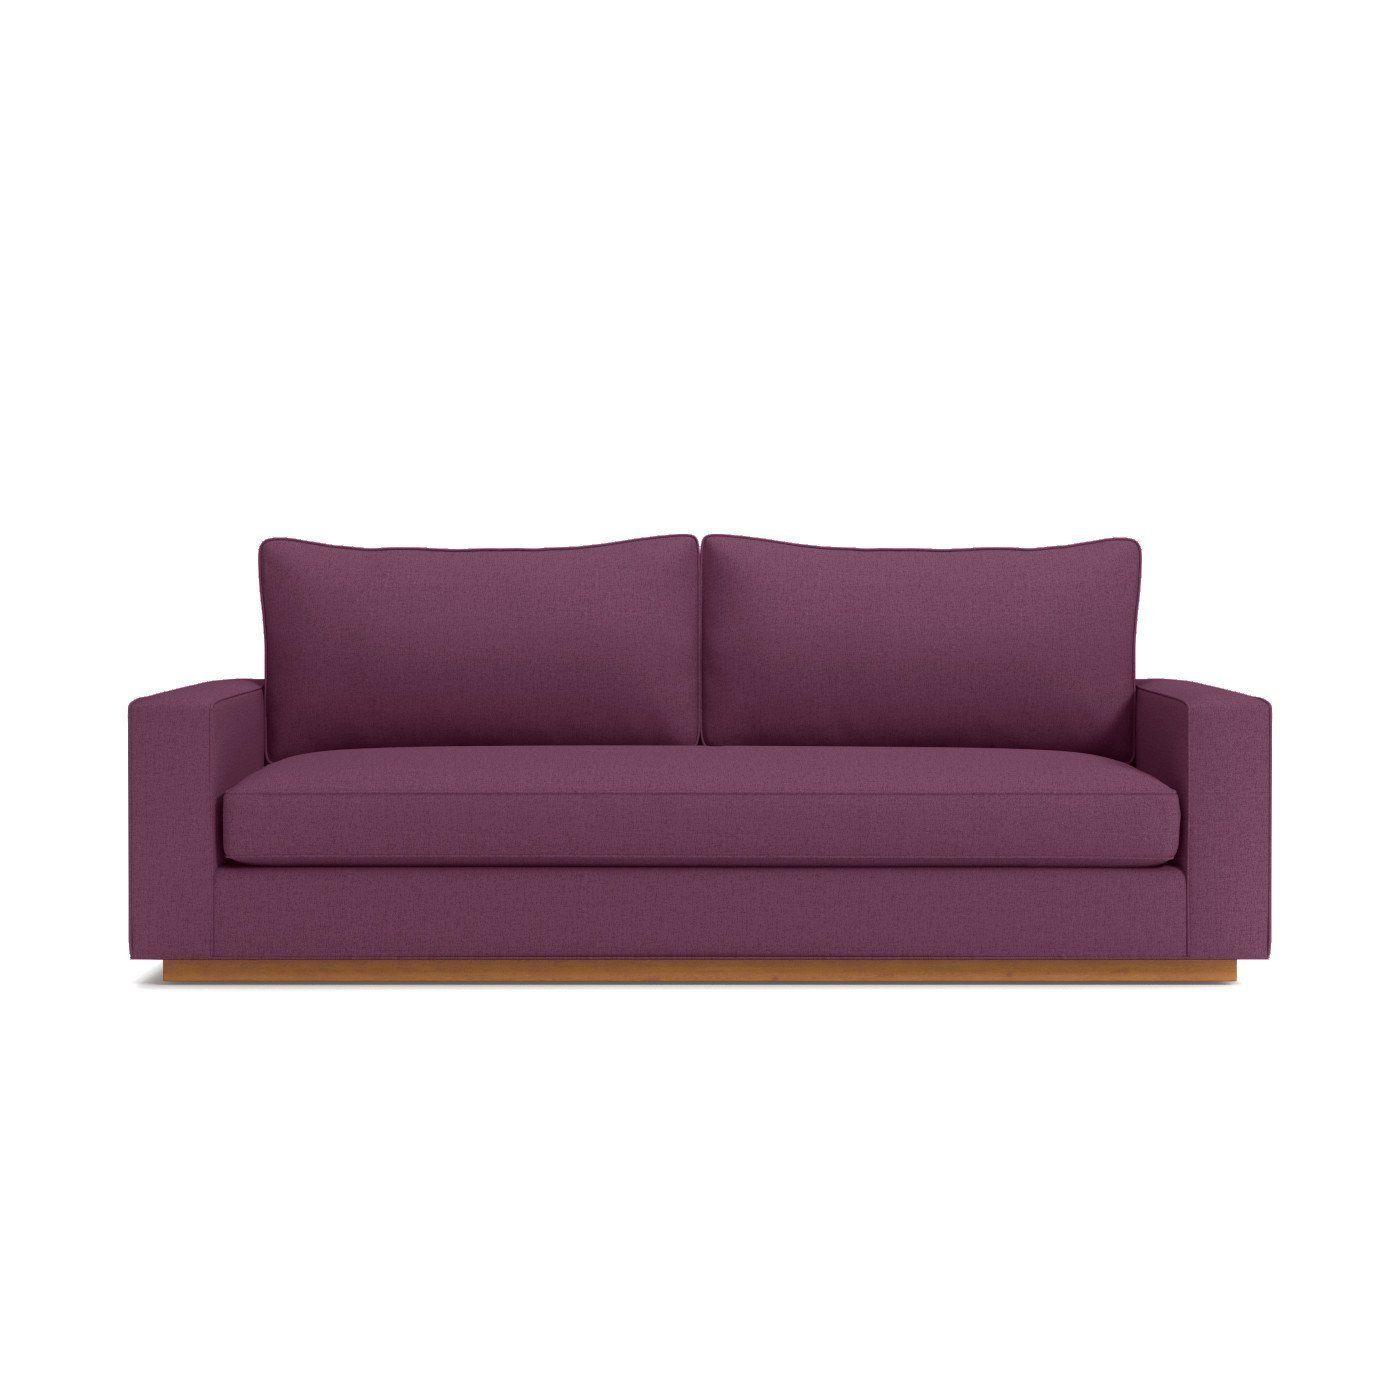 Harper Queen Size Sleeper Sofa In Amethyst Clearance Queen Size Sleeper Sofa Sofa Affordable Modern Furniture